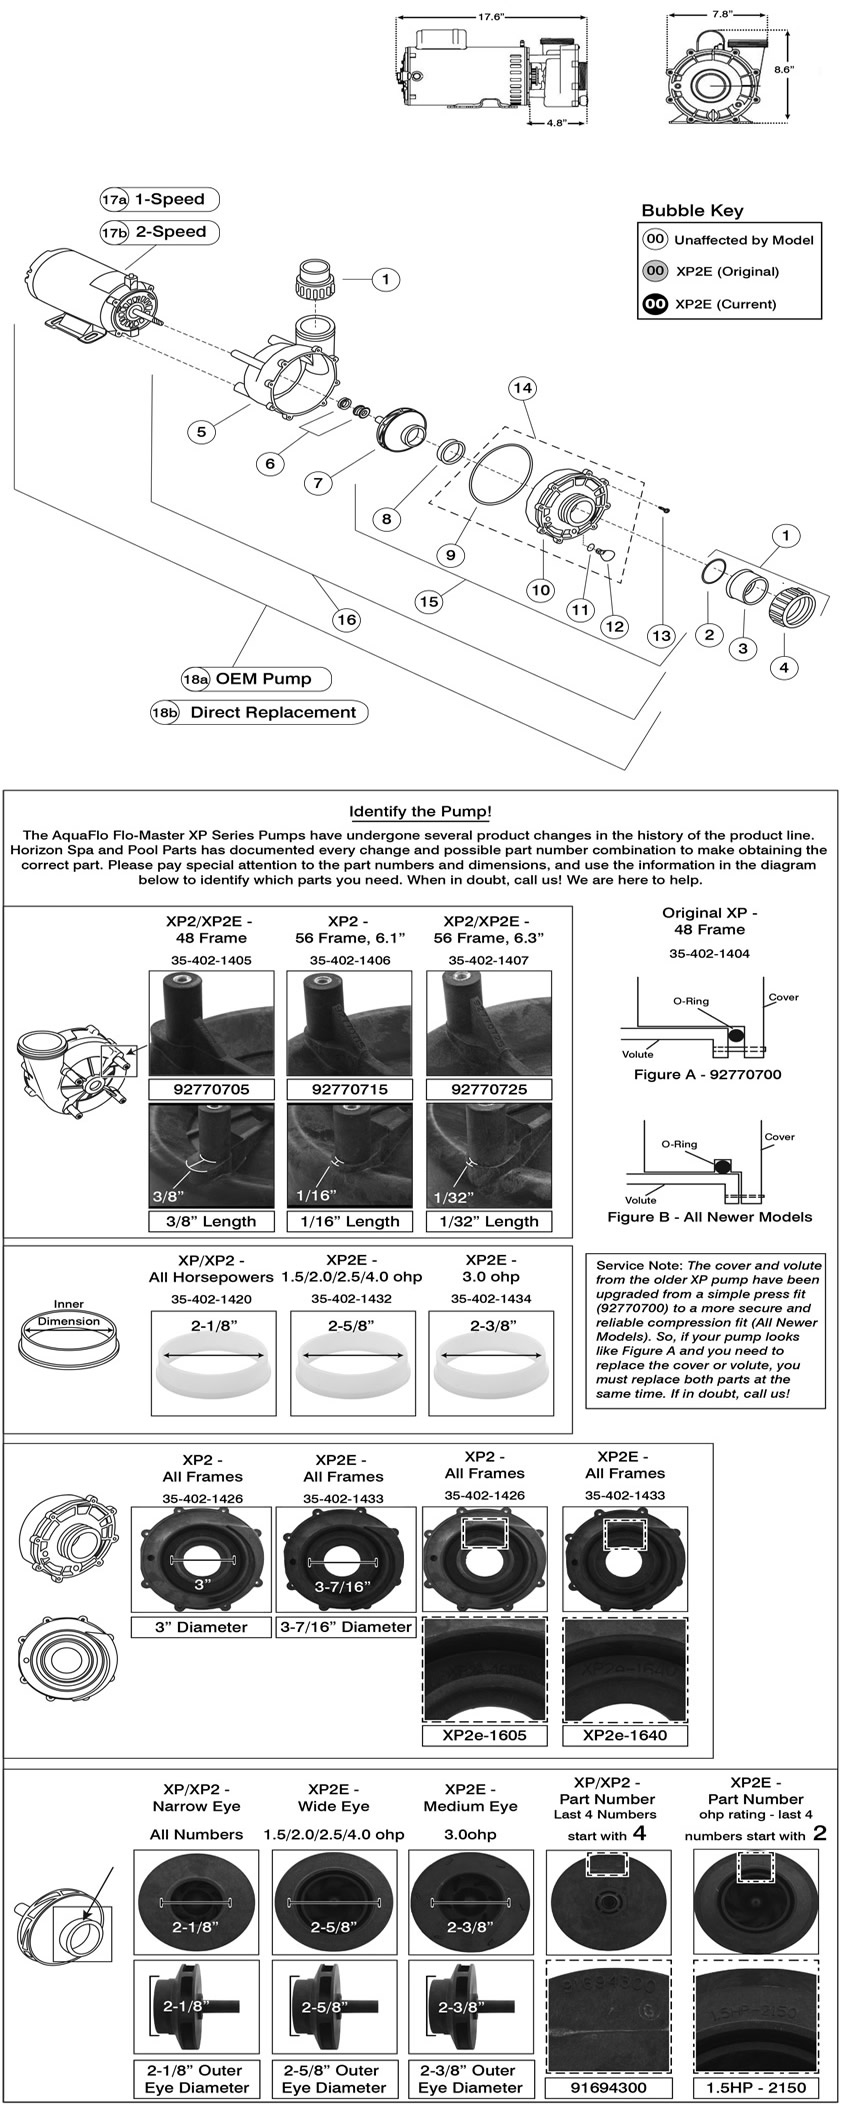 hight resolution of aqua flo pump wiring diagram wiring diagram toolbox xp2 aqua flo pump wiring diagram aqua flo